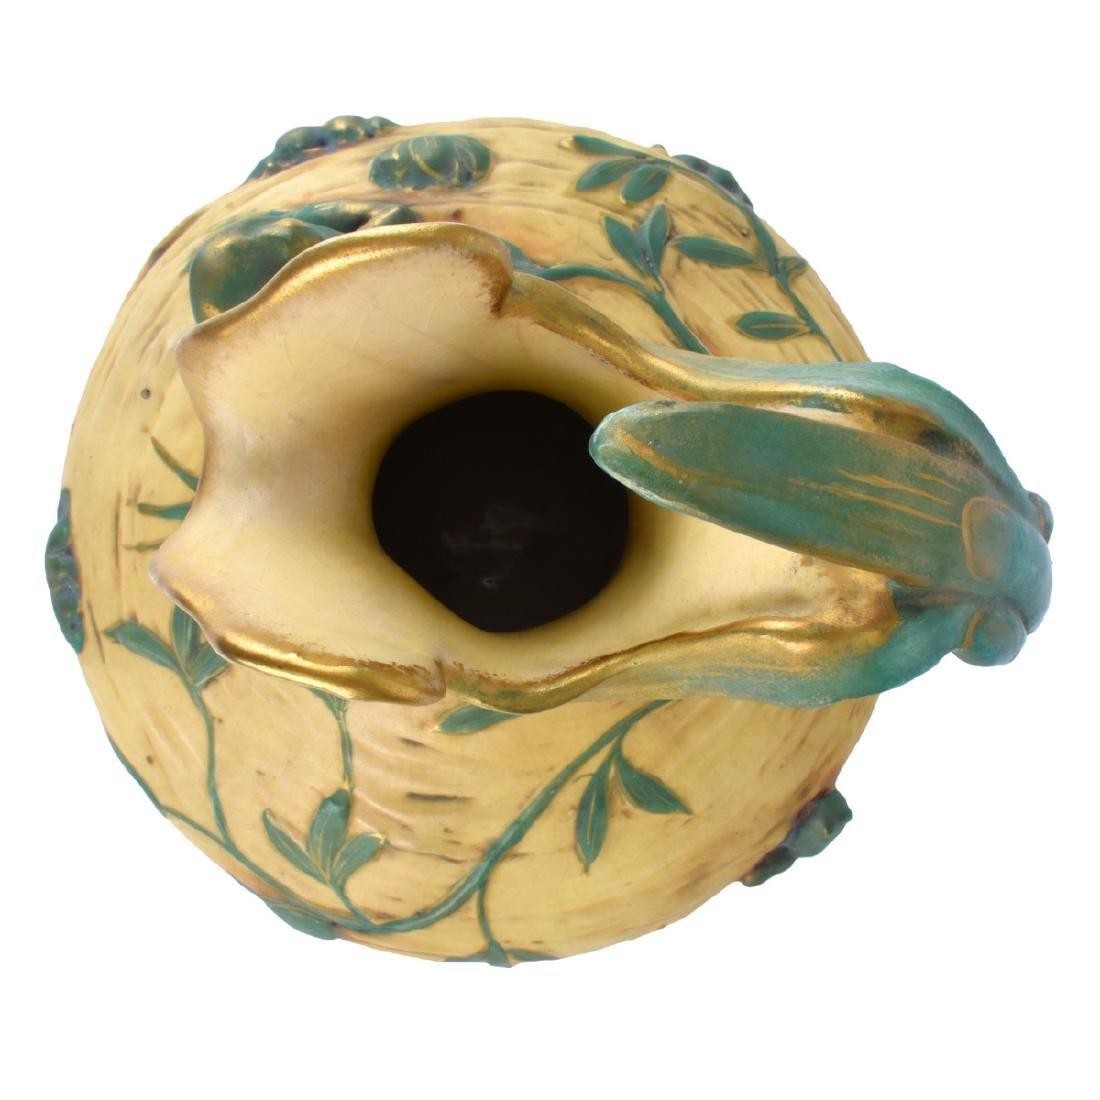 Amphora Art Nouveau Polychrome Pottery Vase - 5